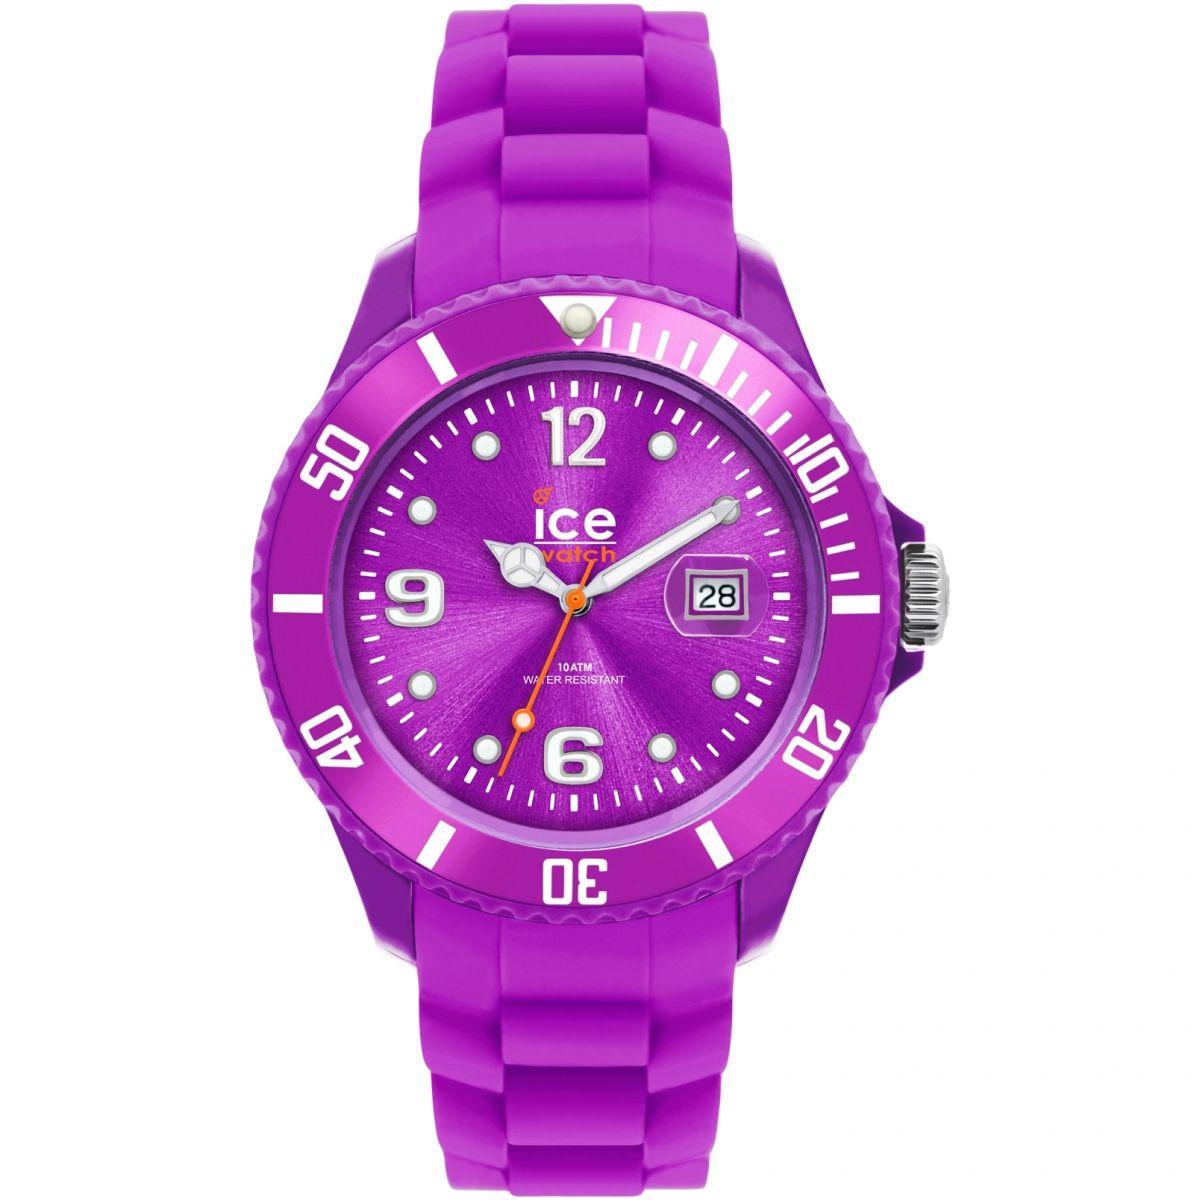 damen ice watch sili purple small uhren 000131. Black Bedroom Furniture Sets. Home Design Ideas